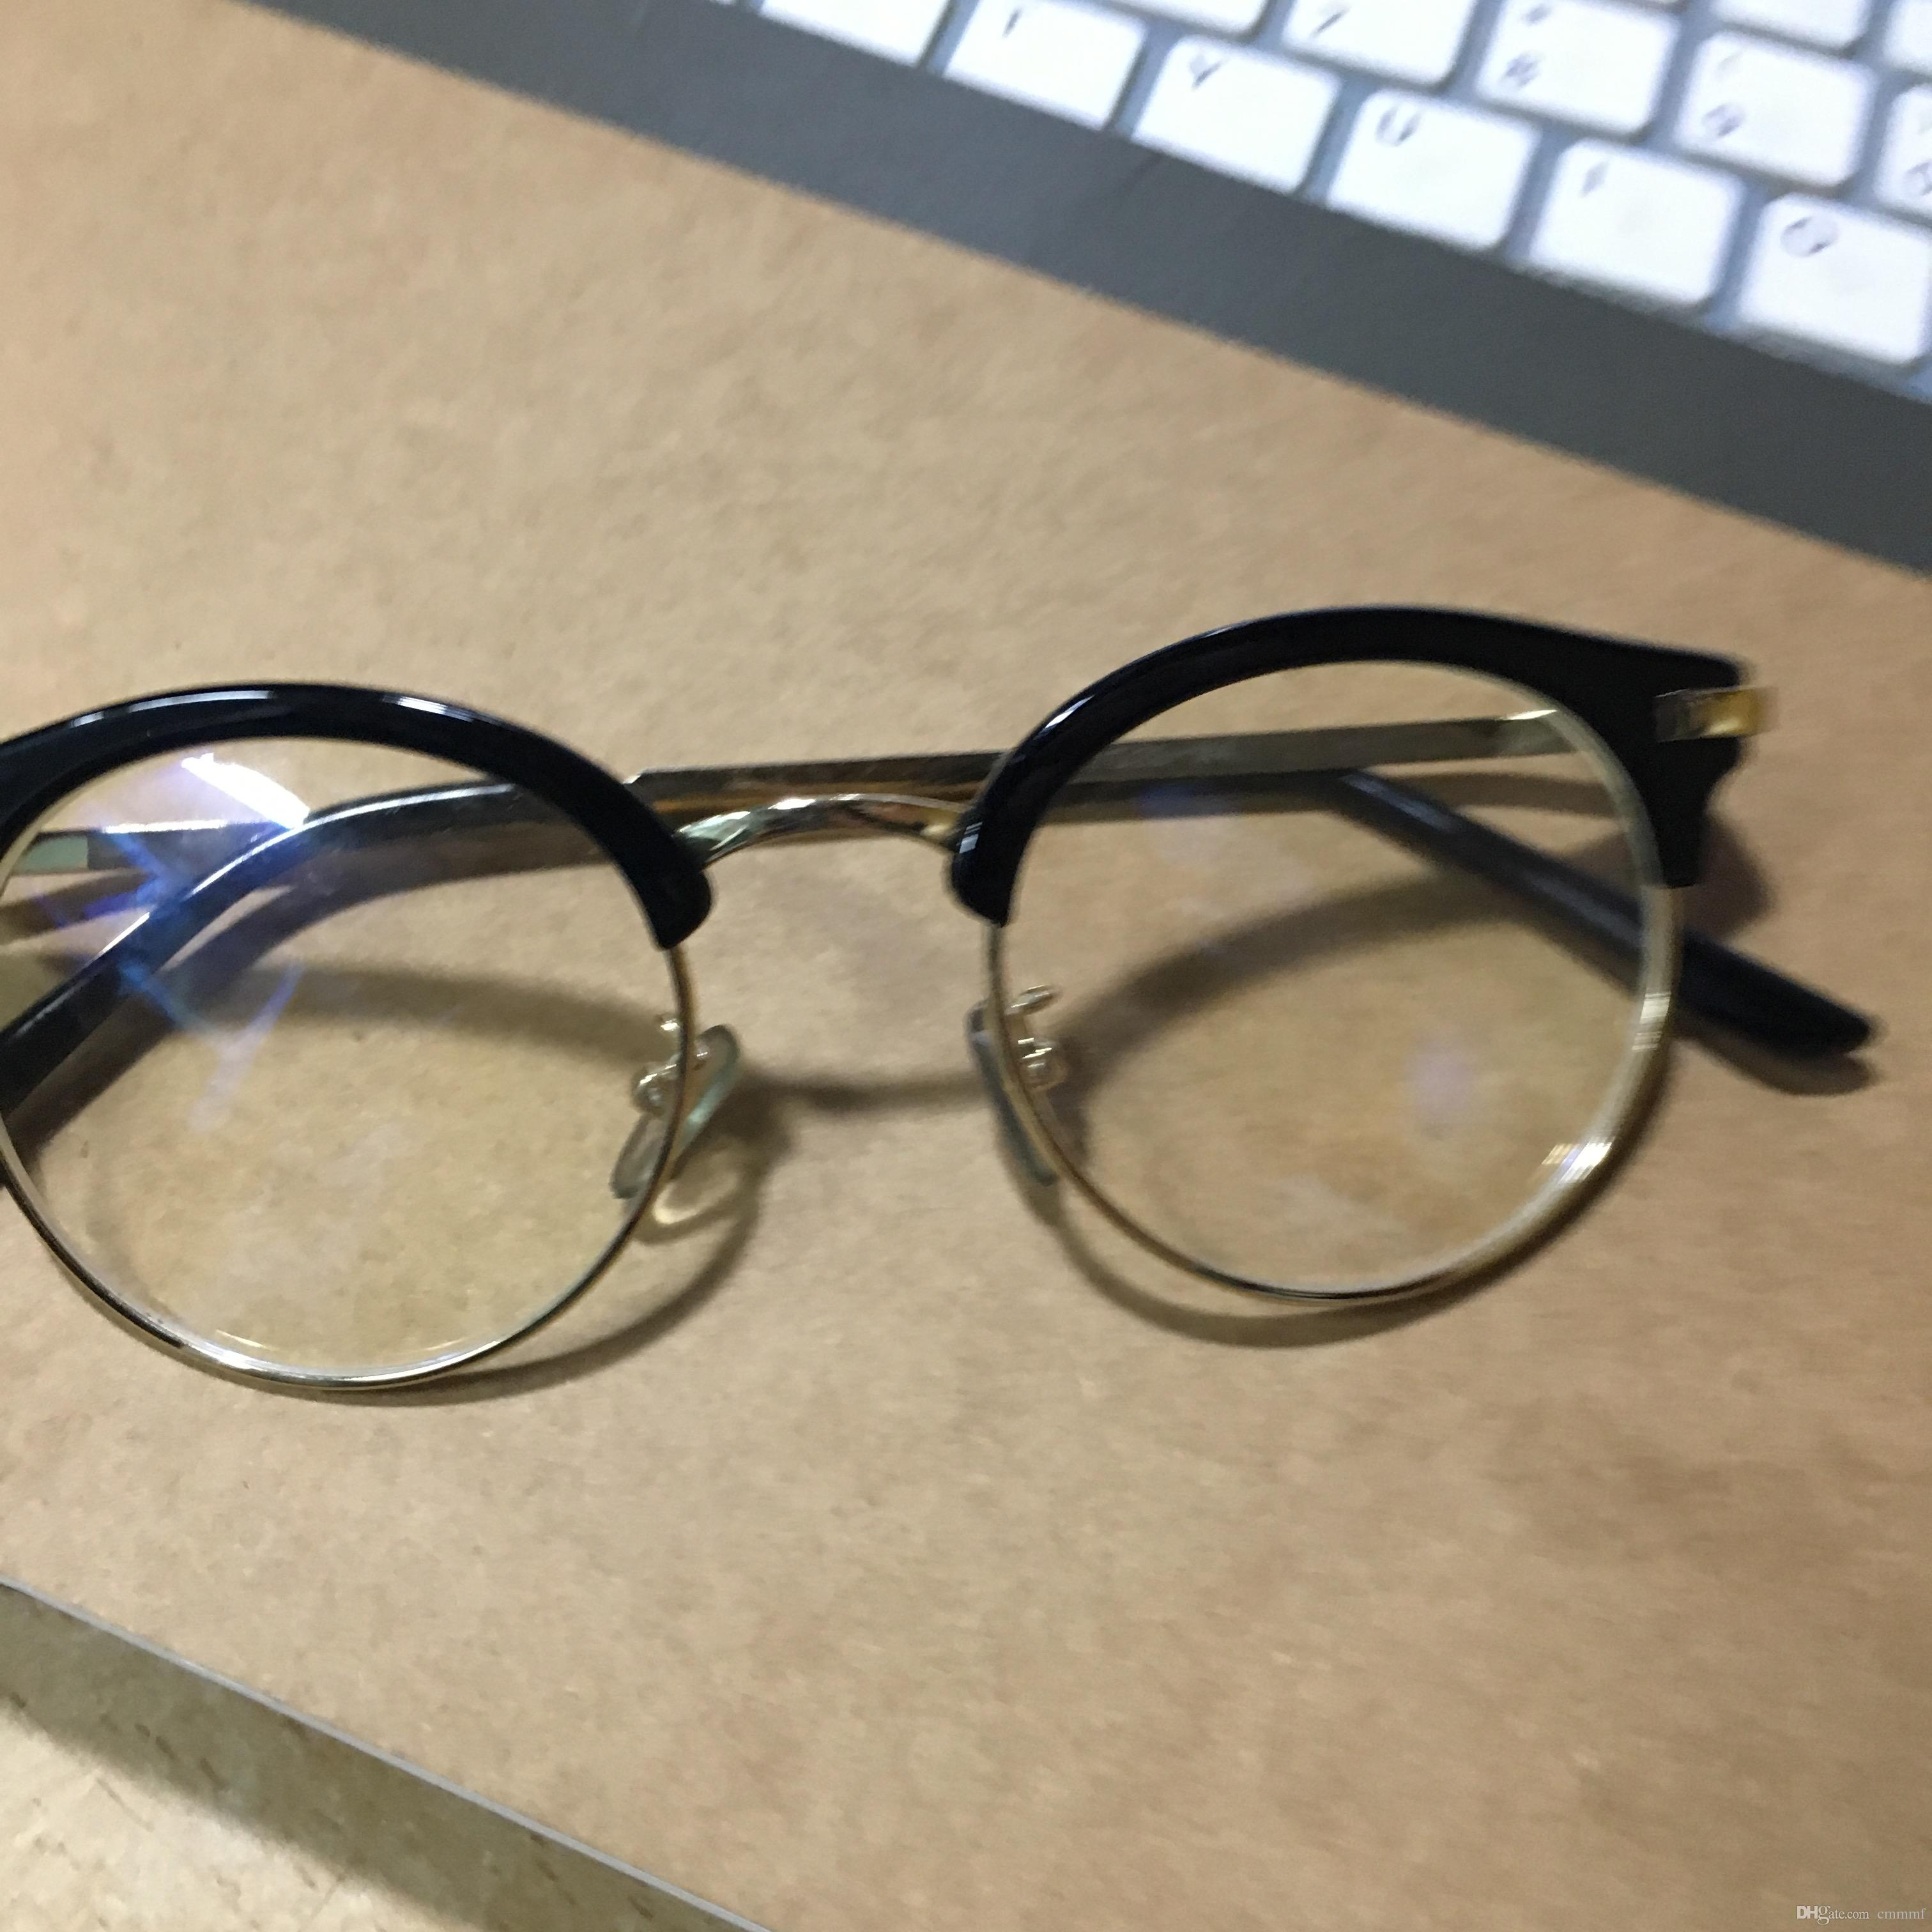 Compre Accesorios De Moda Accesorios Para Gafas Gafas De Sol Marco ...